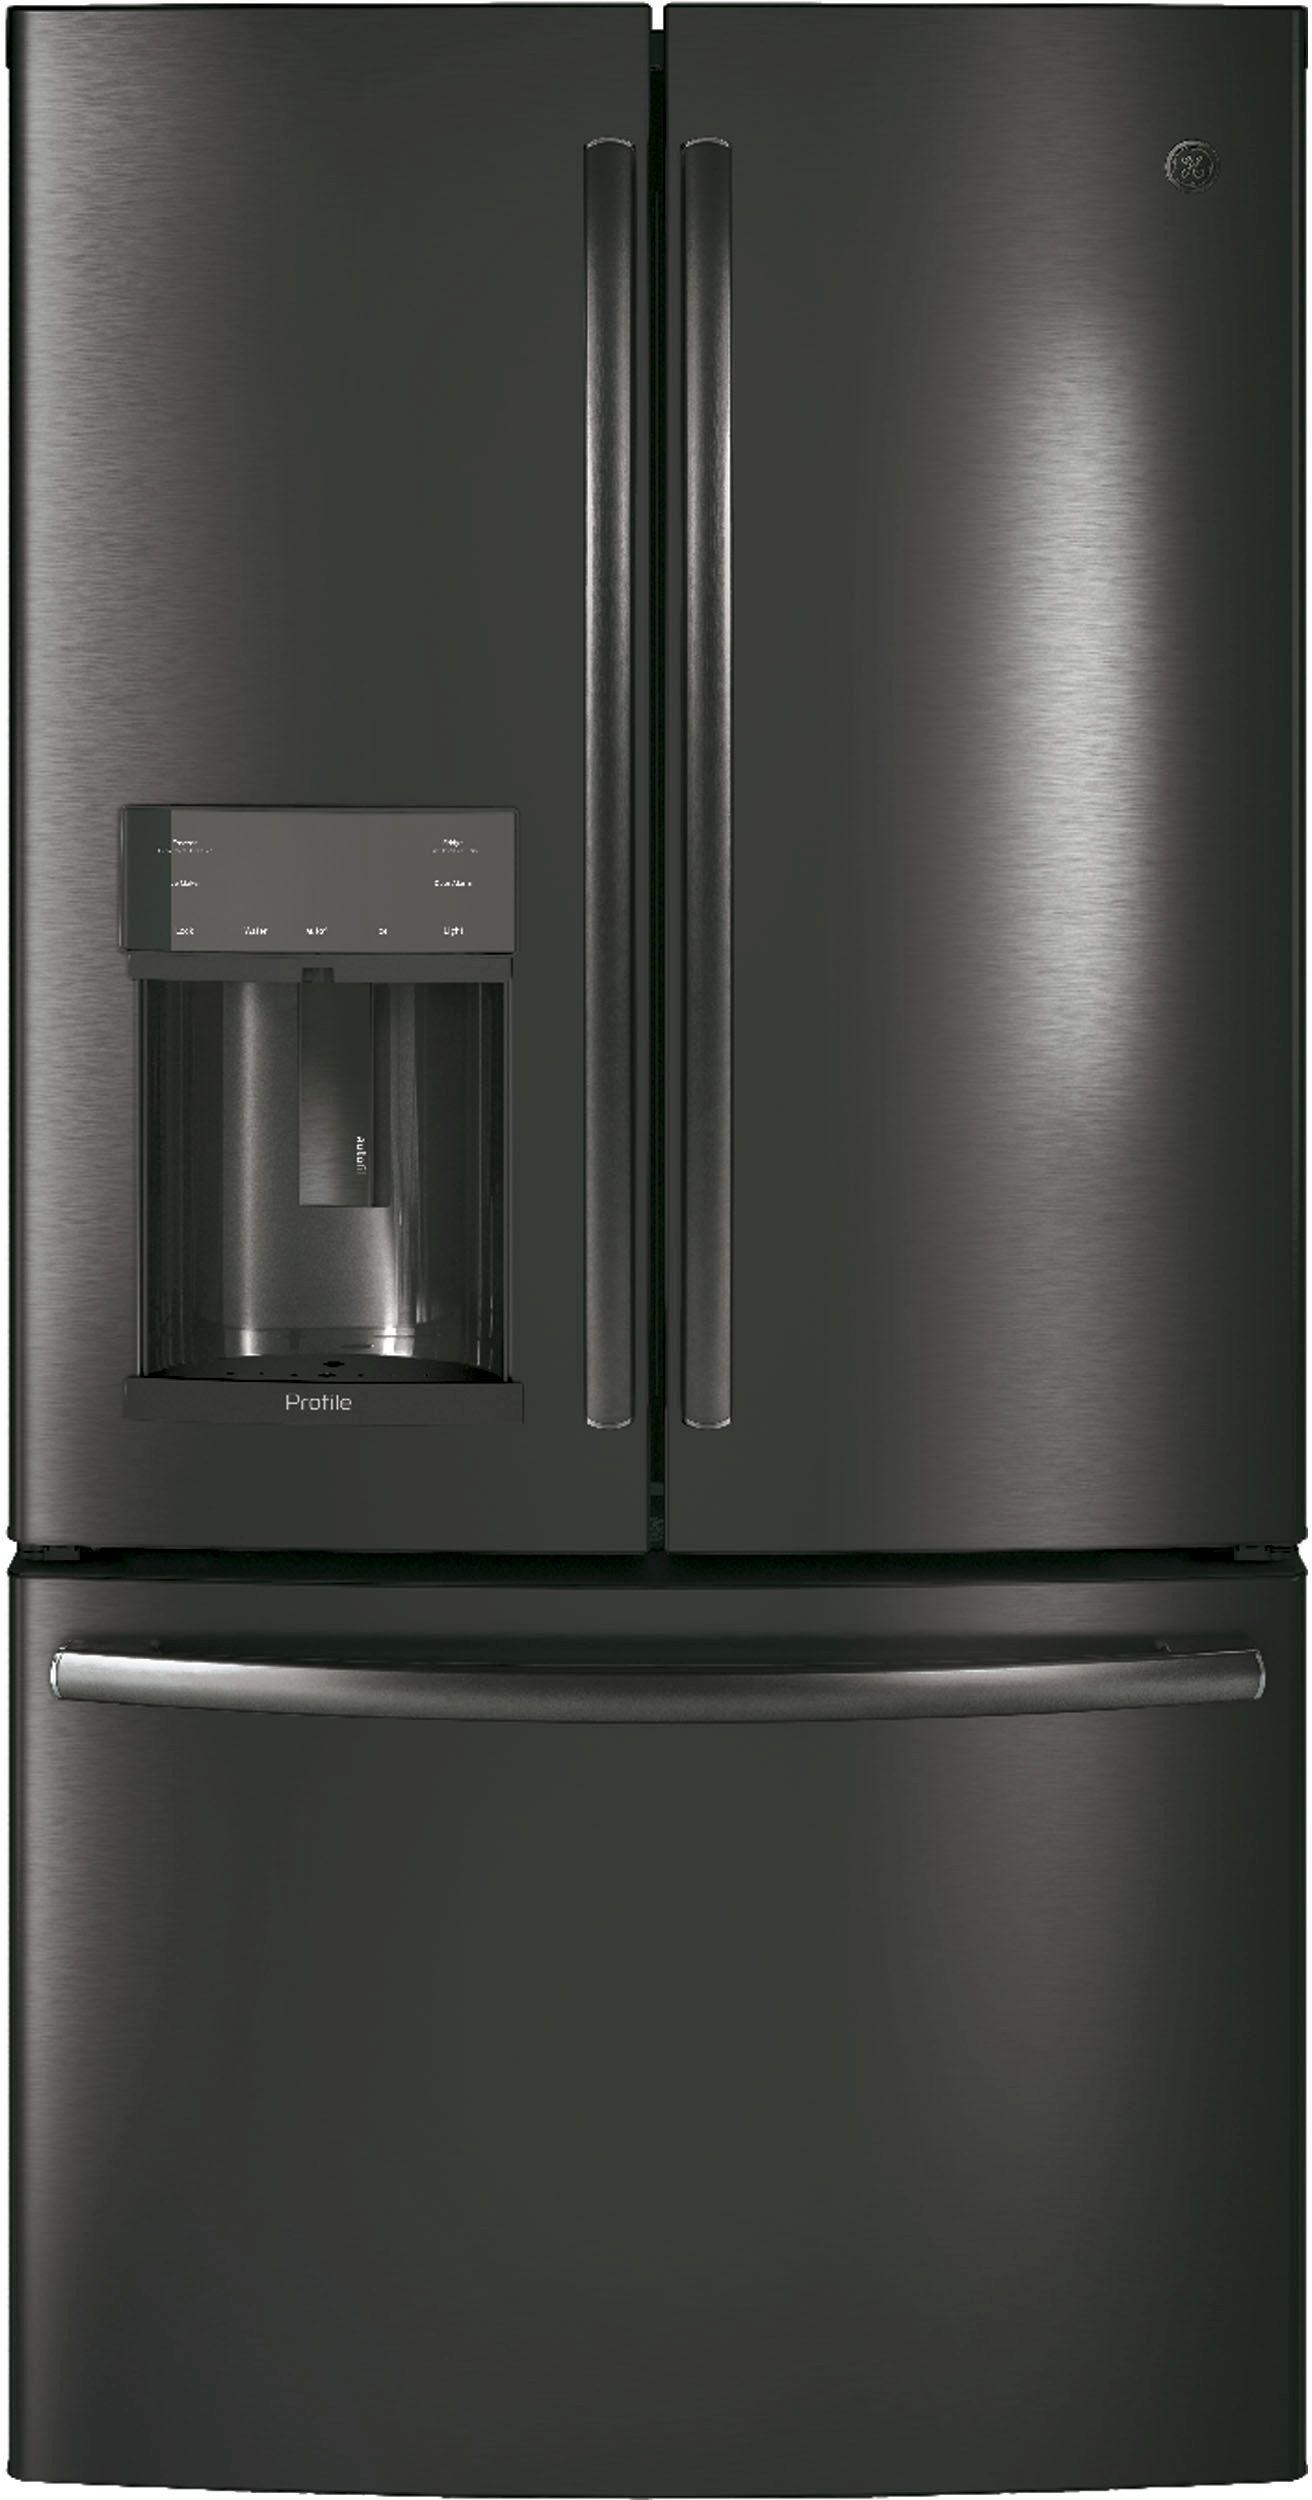 Refrigeration ge profile series 278 cu ft french door refrigerator black stainless steel rubansaba